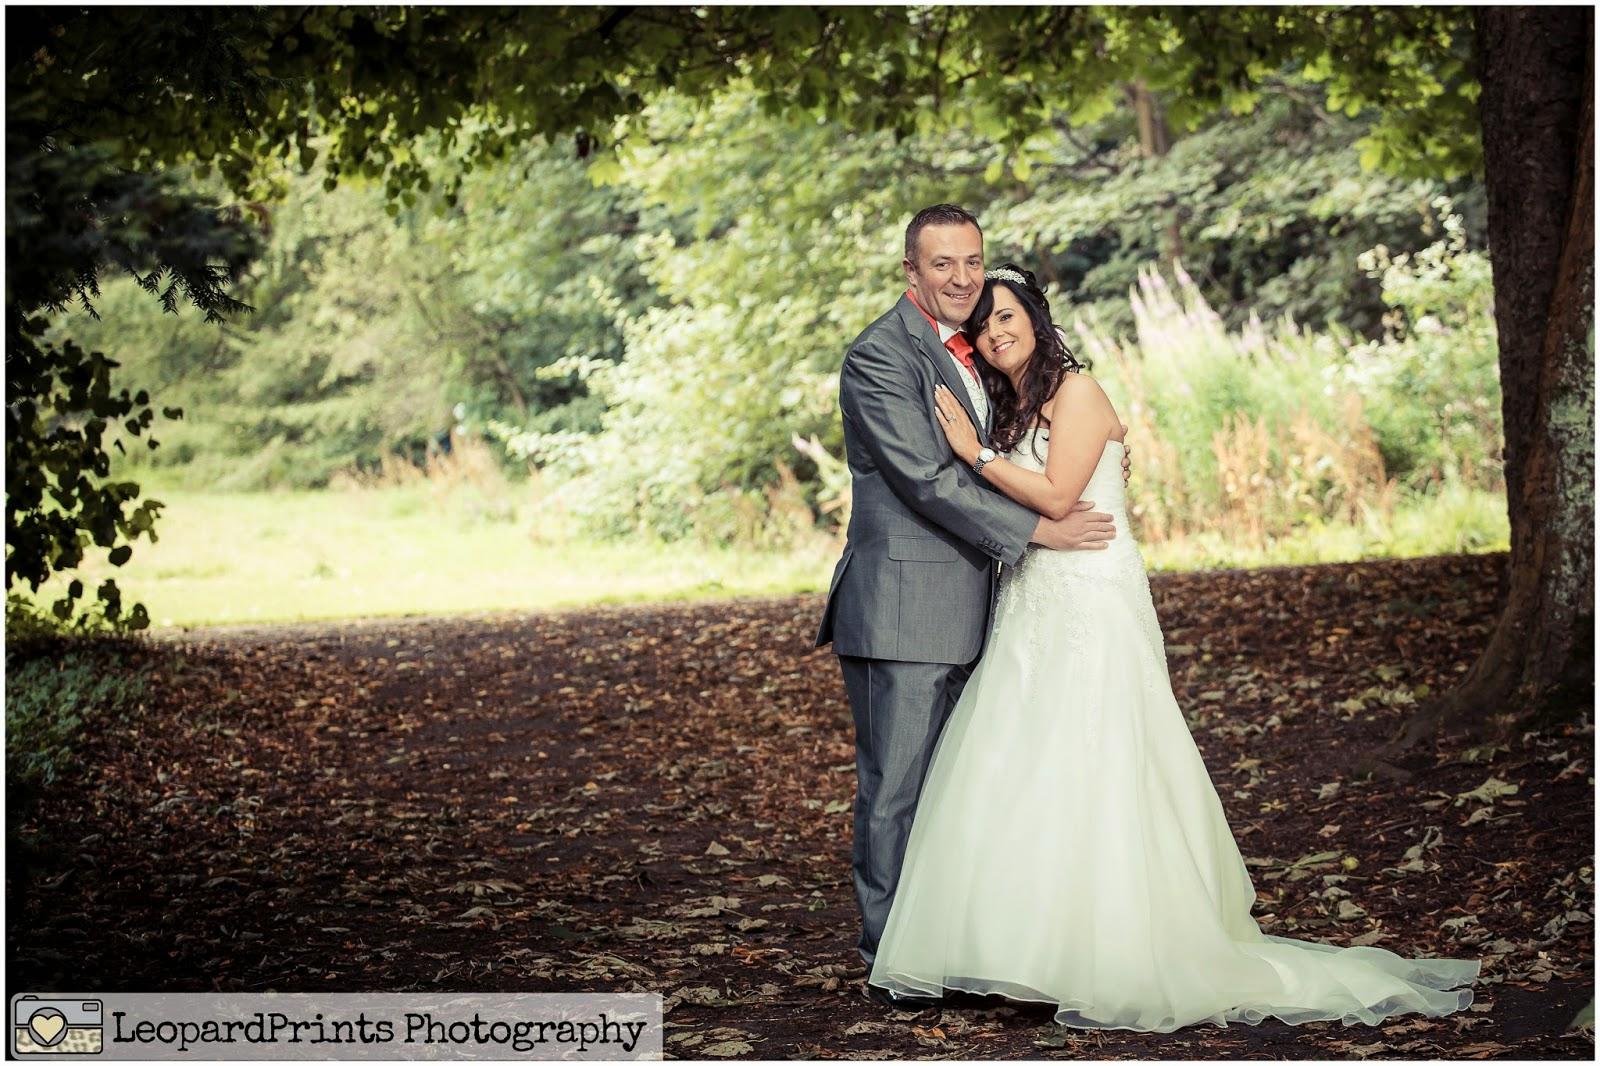 Wedding Chair Covers Newcastle Upon Tyne Inada Sogno Dreamwave Massage Leopardprints Weddings: Photographer At Jesmond Dene House